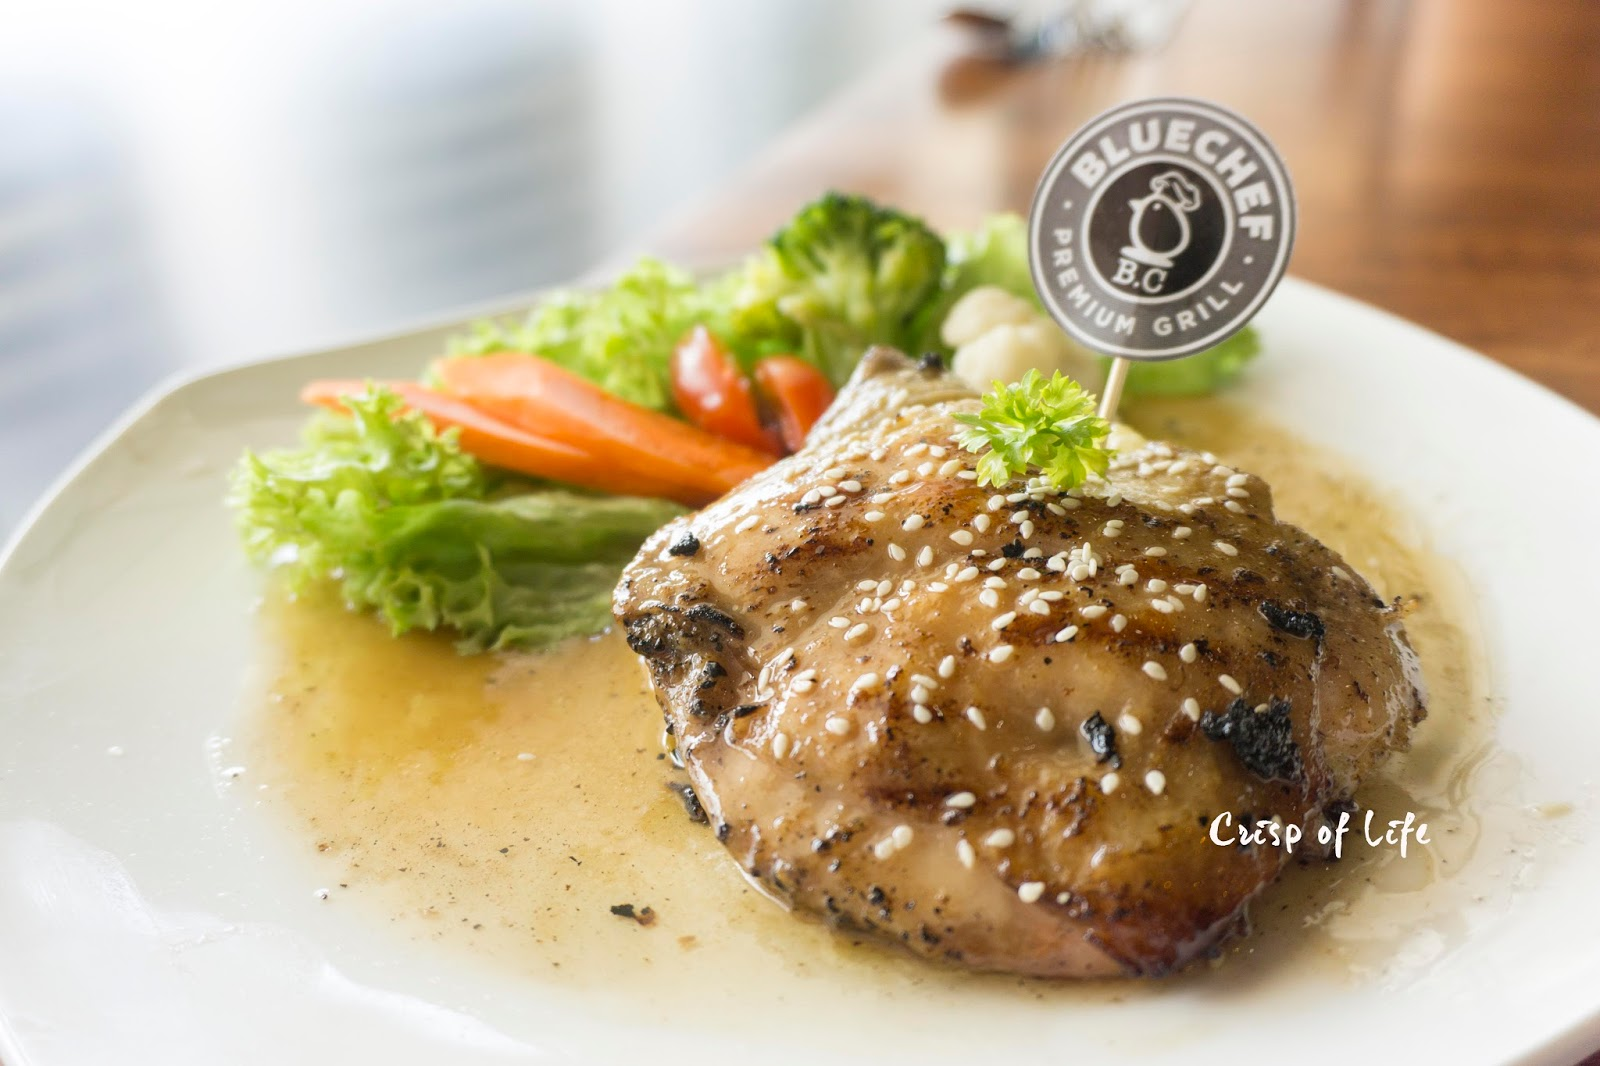 Blue Chef Premium Grill & Pasta @ I-Avenue, Bayan Lepas, Penang